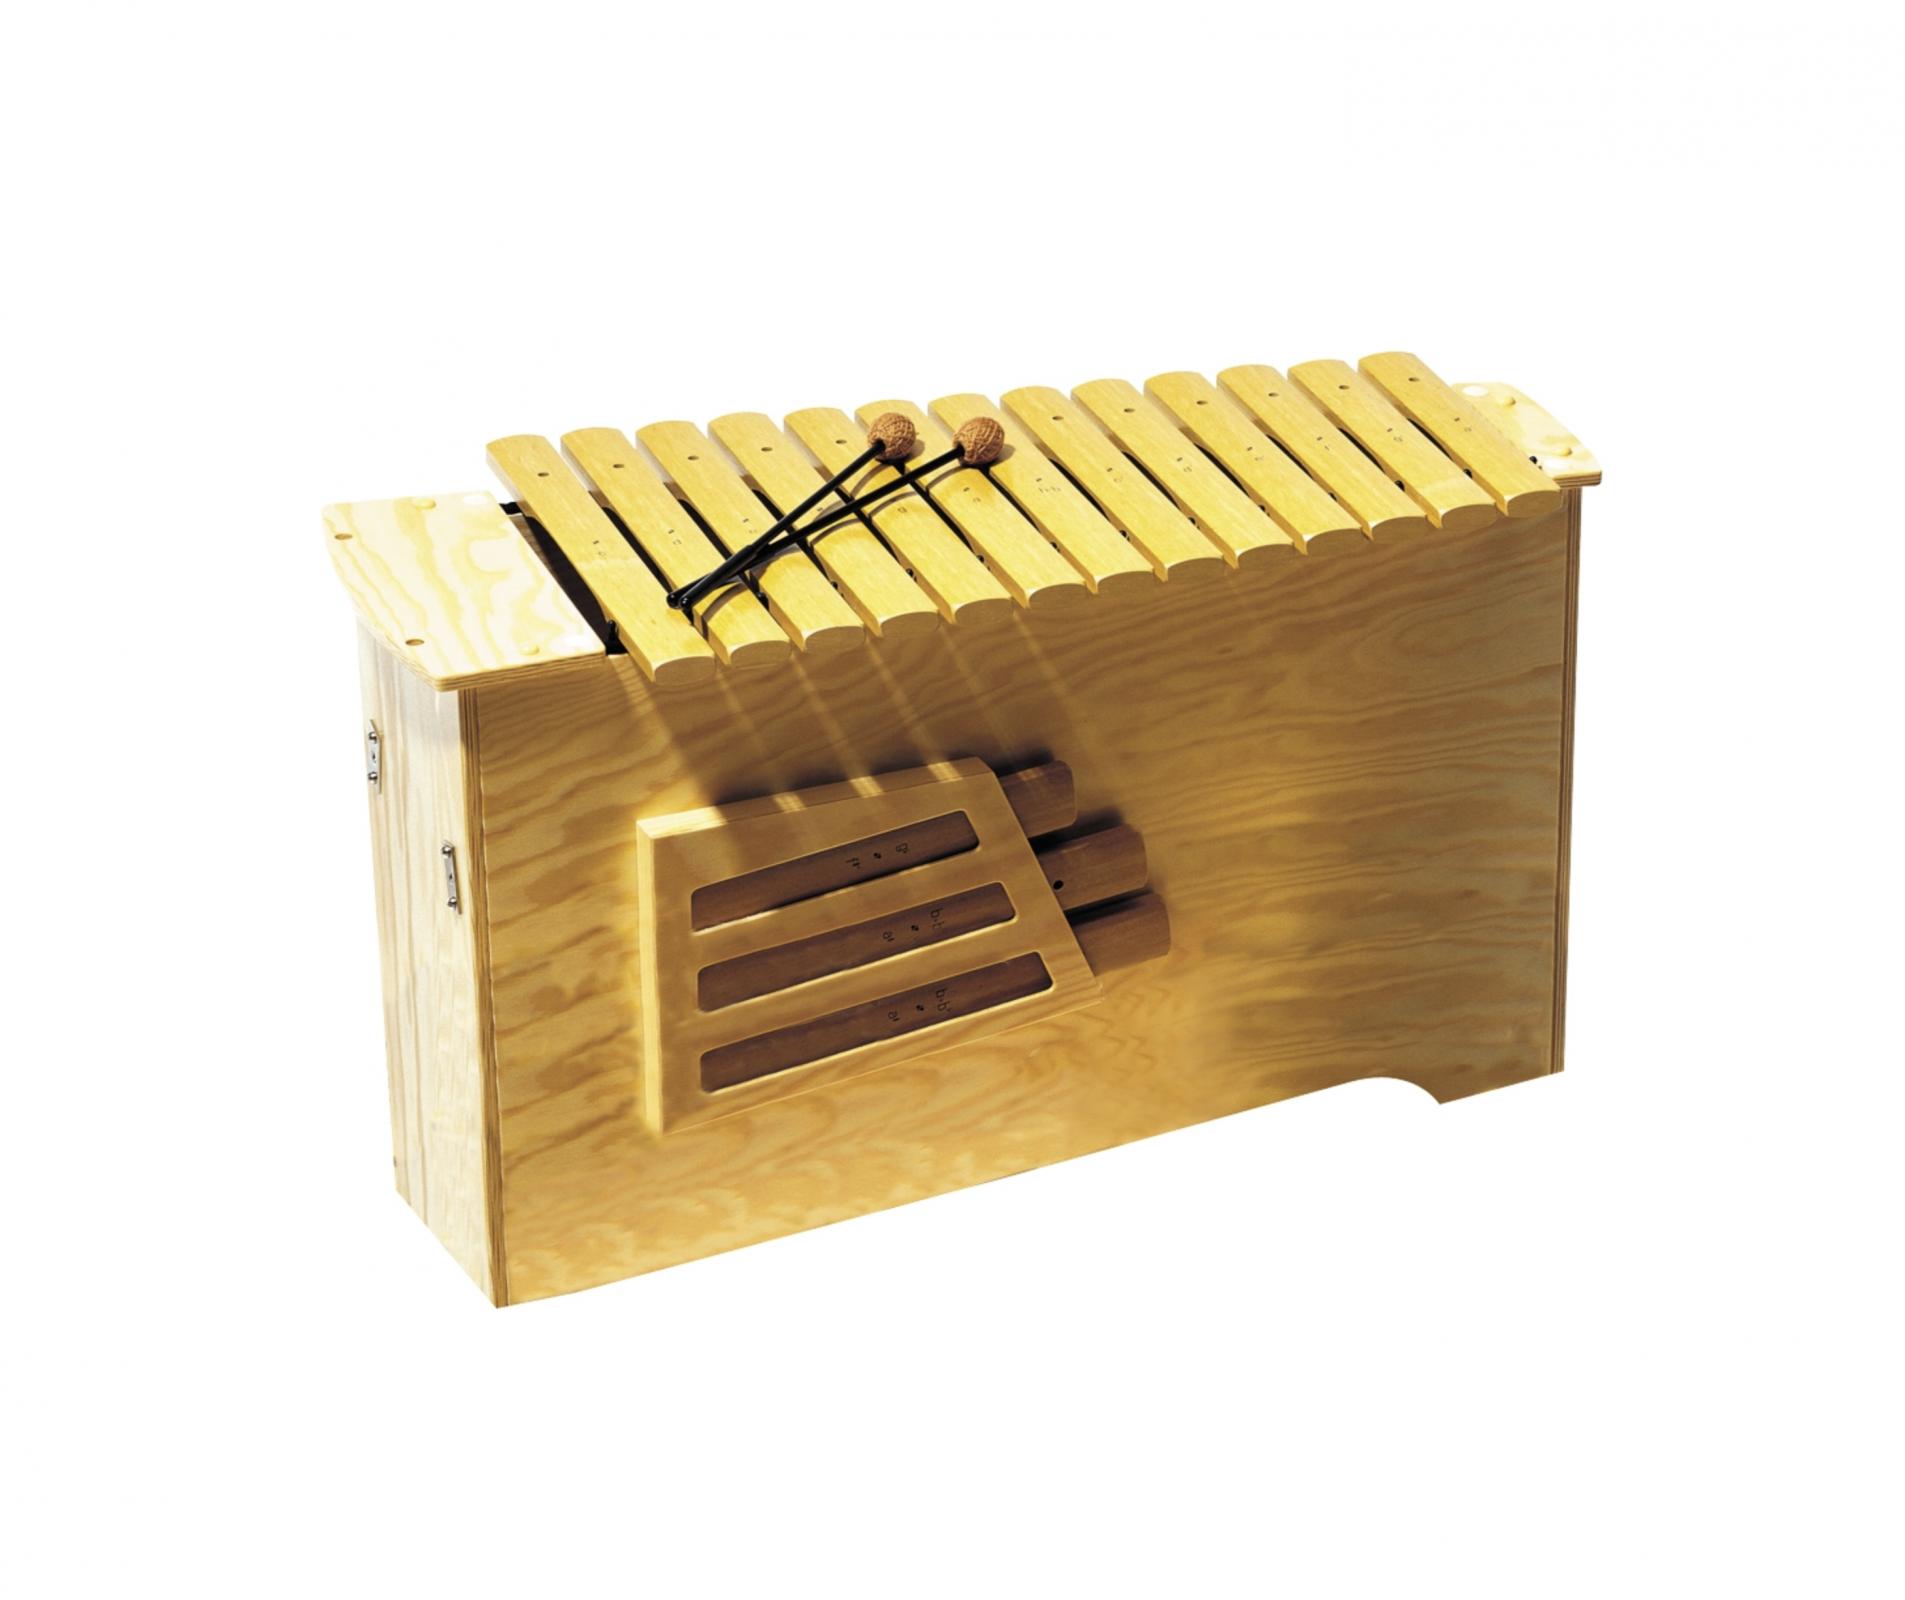 Sonor Palisono GBKX 100 Deep Bass Xylophone